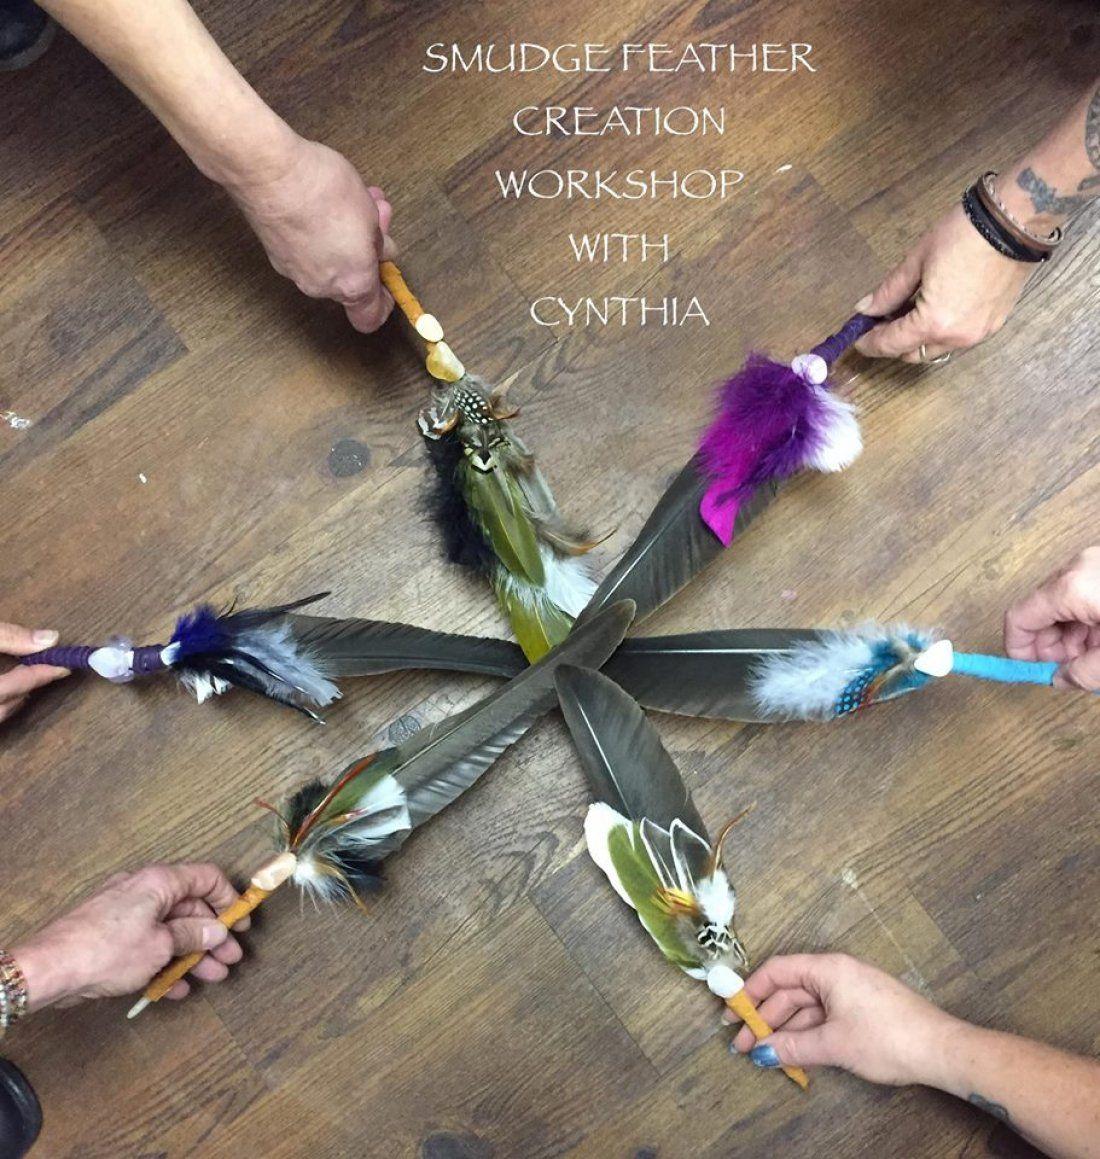 Smudge Feather Creation Workshop